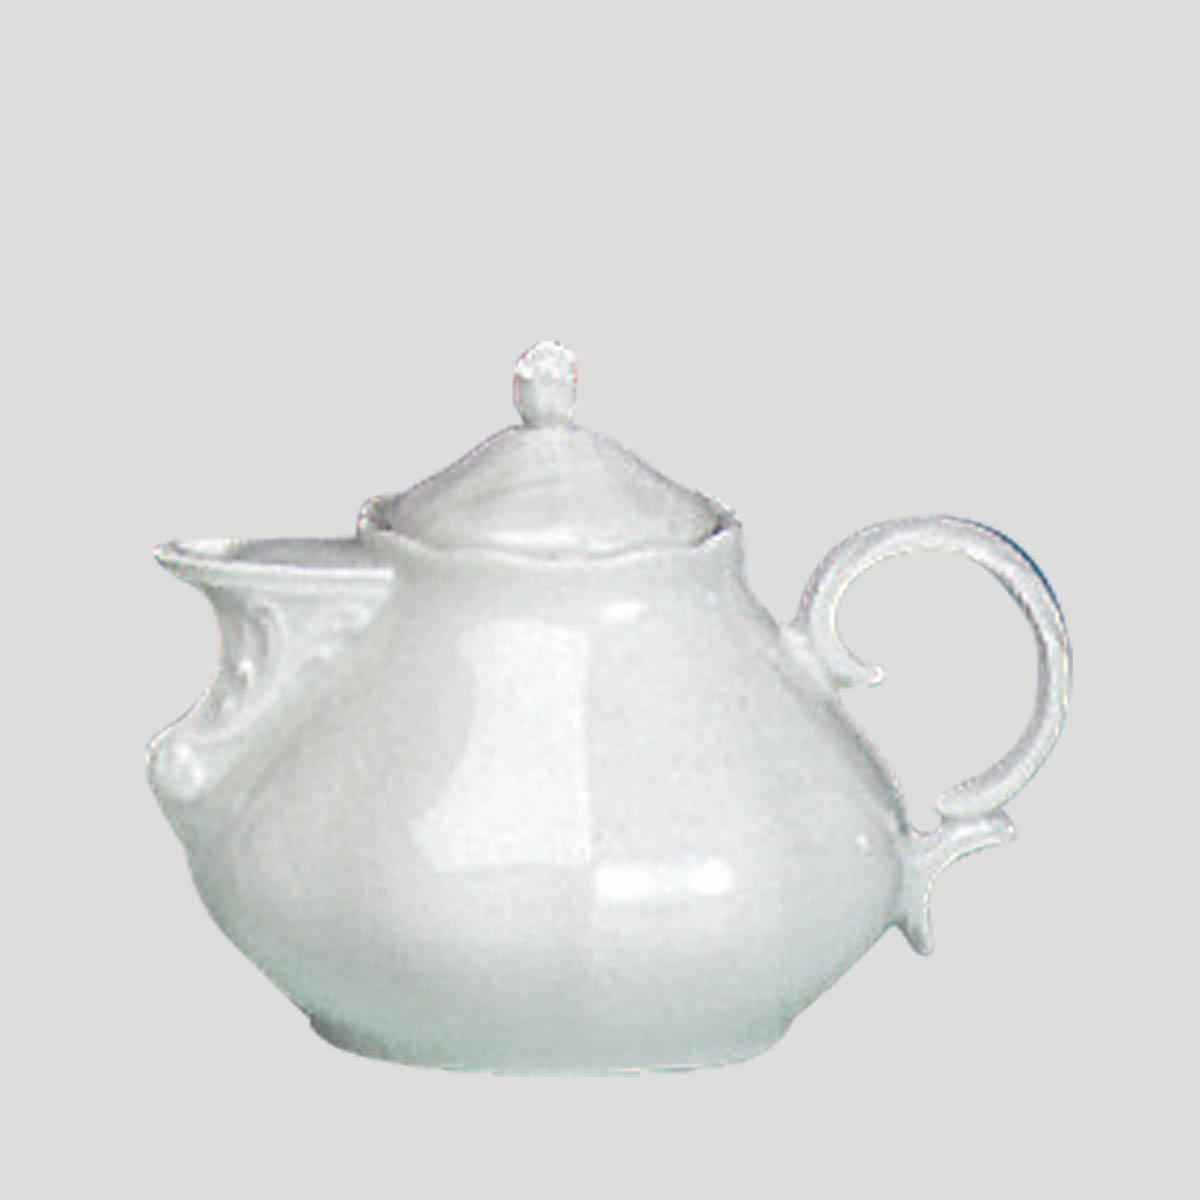 Teiera vienna - teiera in porcellana - Gardagel